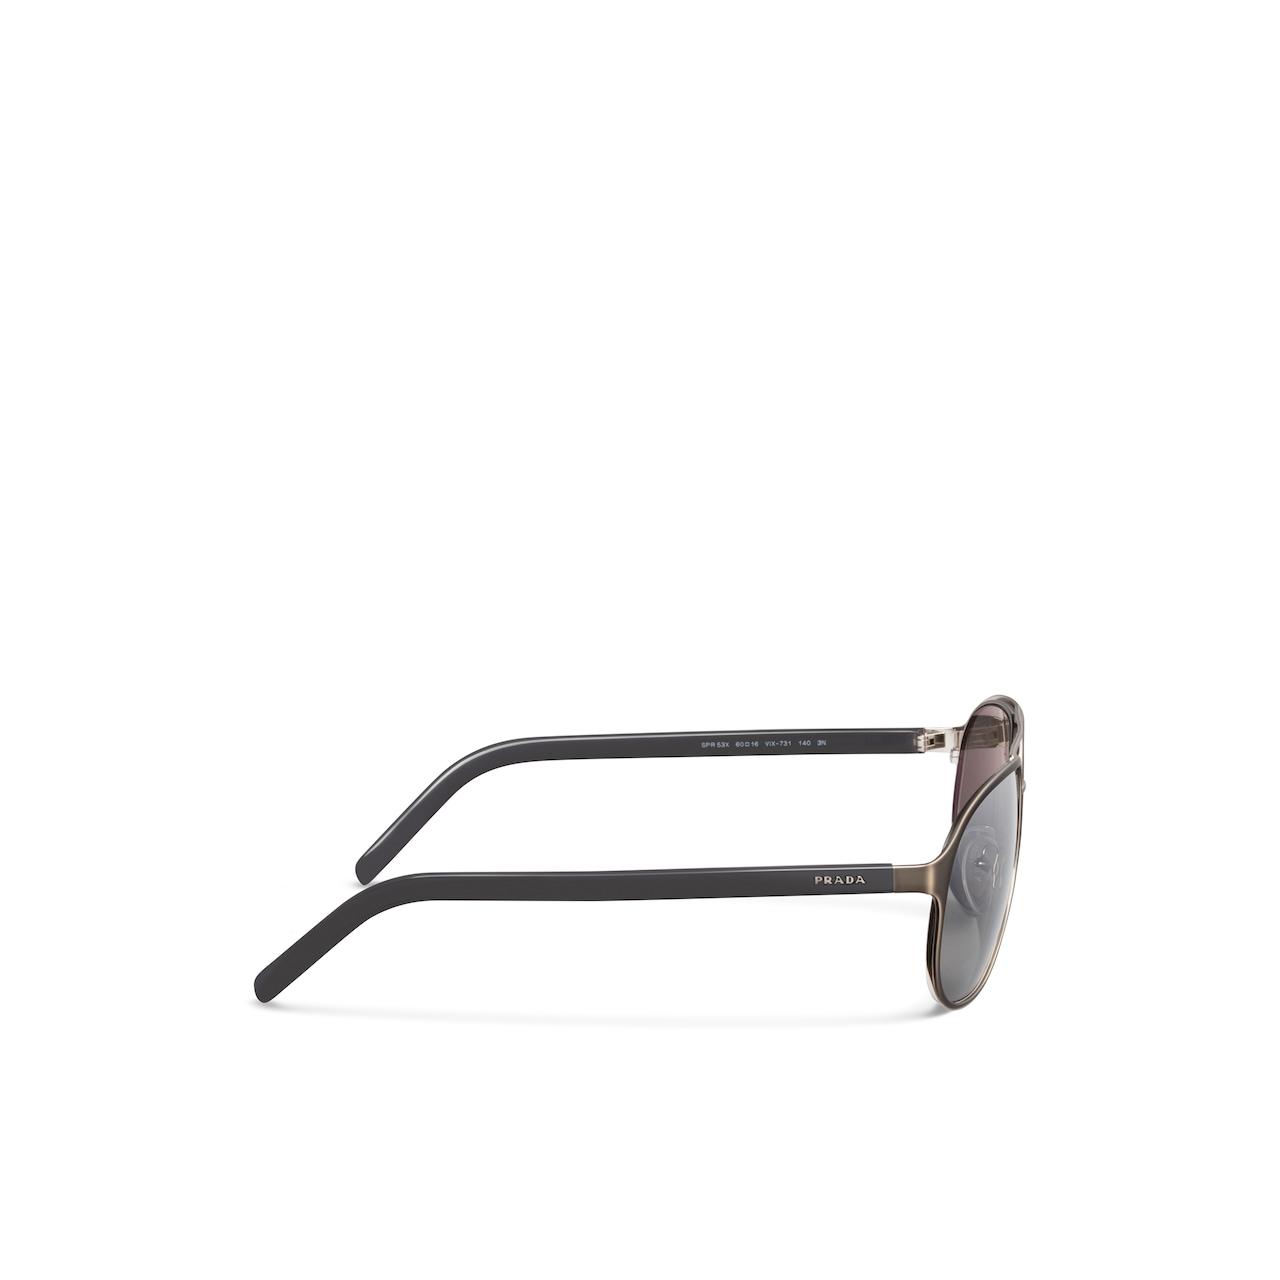 Prada Prada Eyewear 系列太阳镜 4